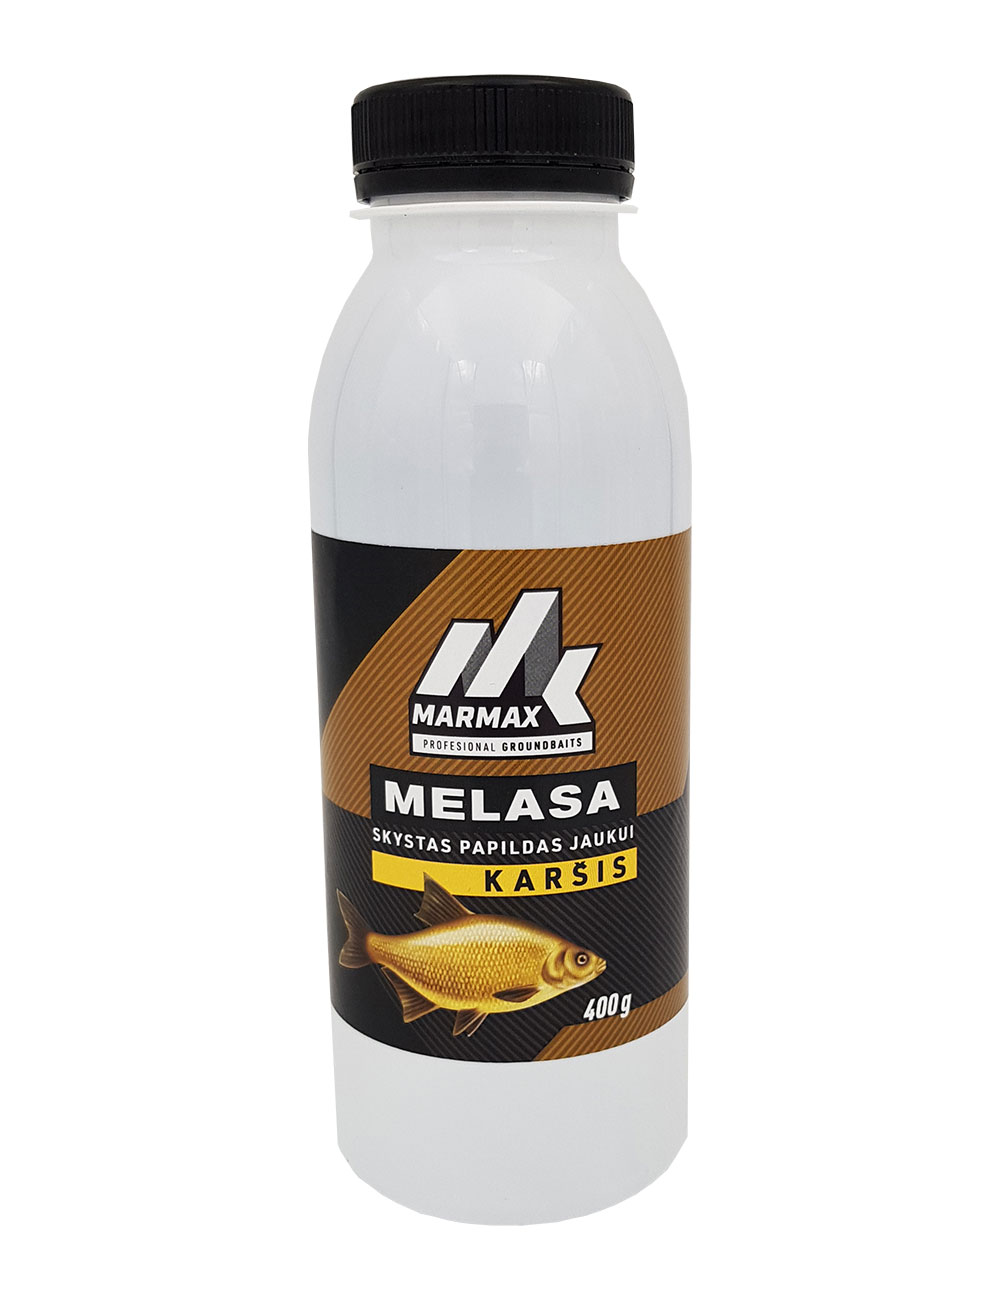 Melasa - Karšis (400g)